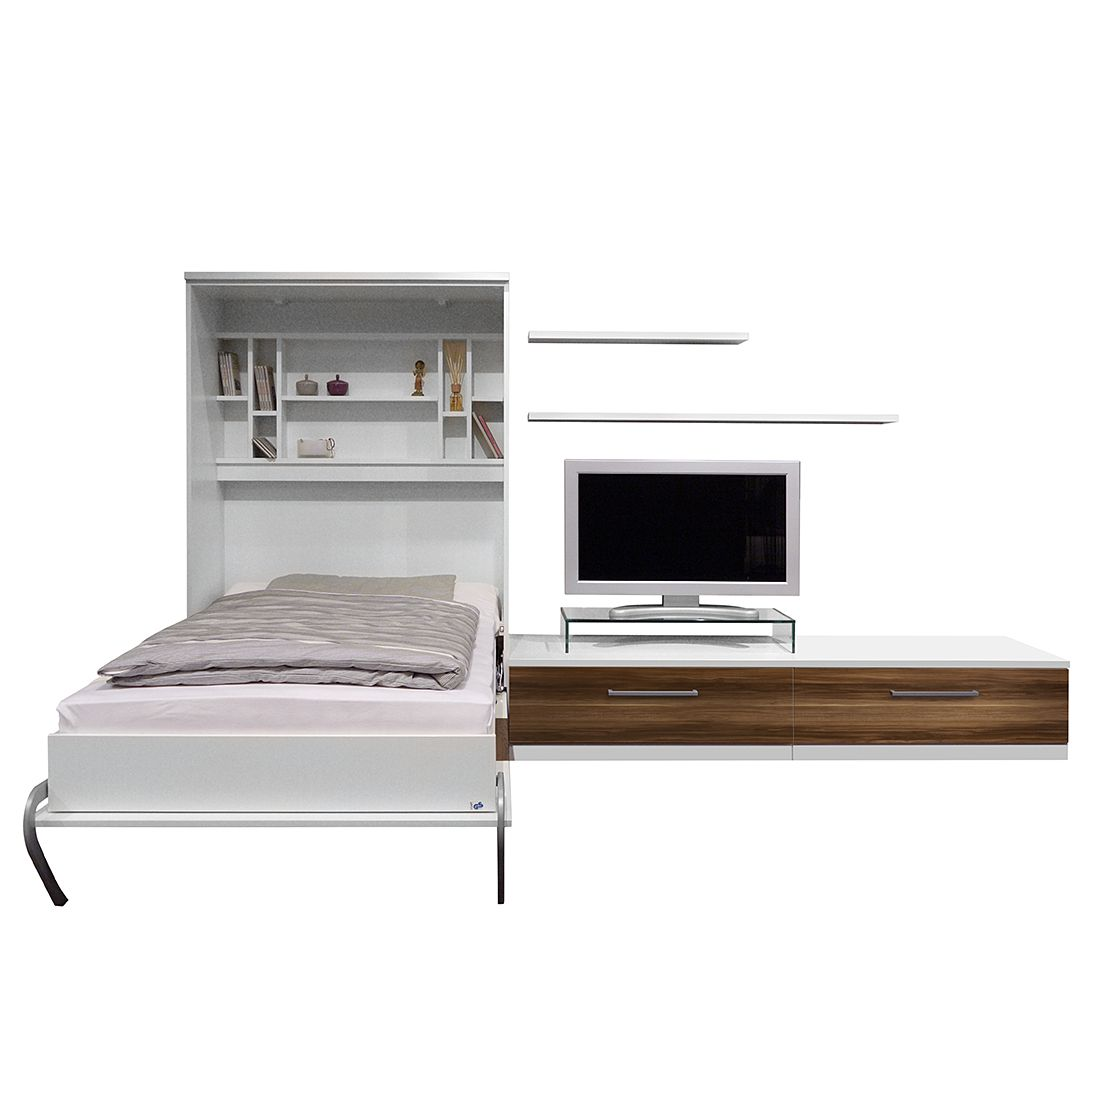 goedkoop Wandklapbed combinatie Majano 160 x 205 cm Bonell binnenveringmatras Wit notenboomhouten look Fredriks